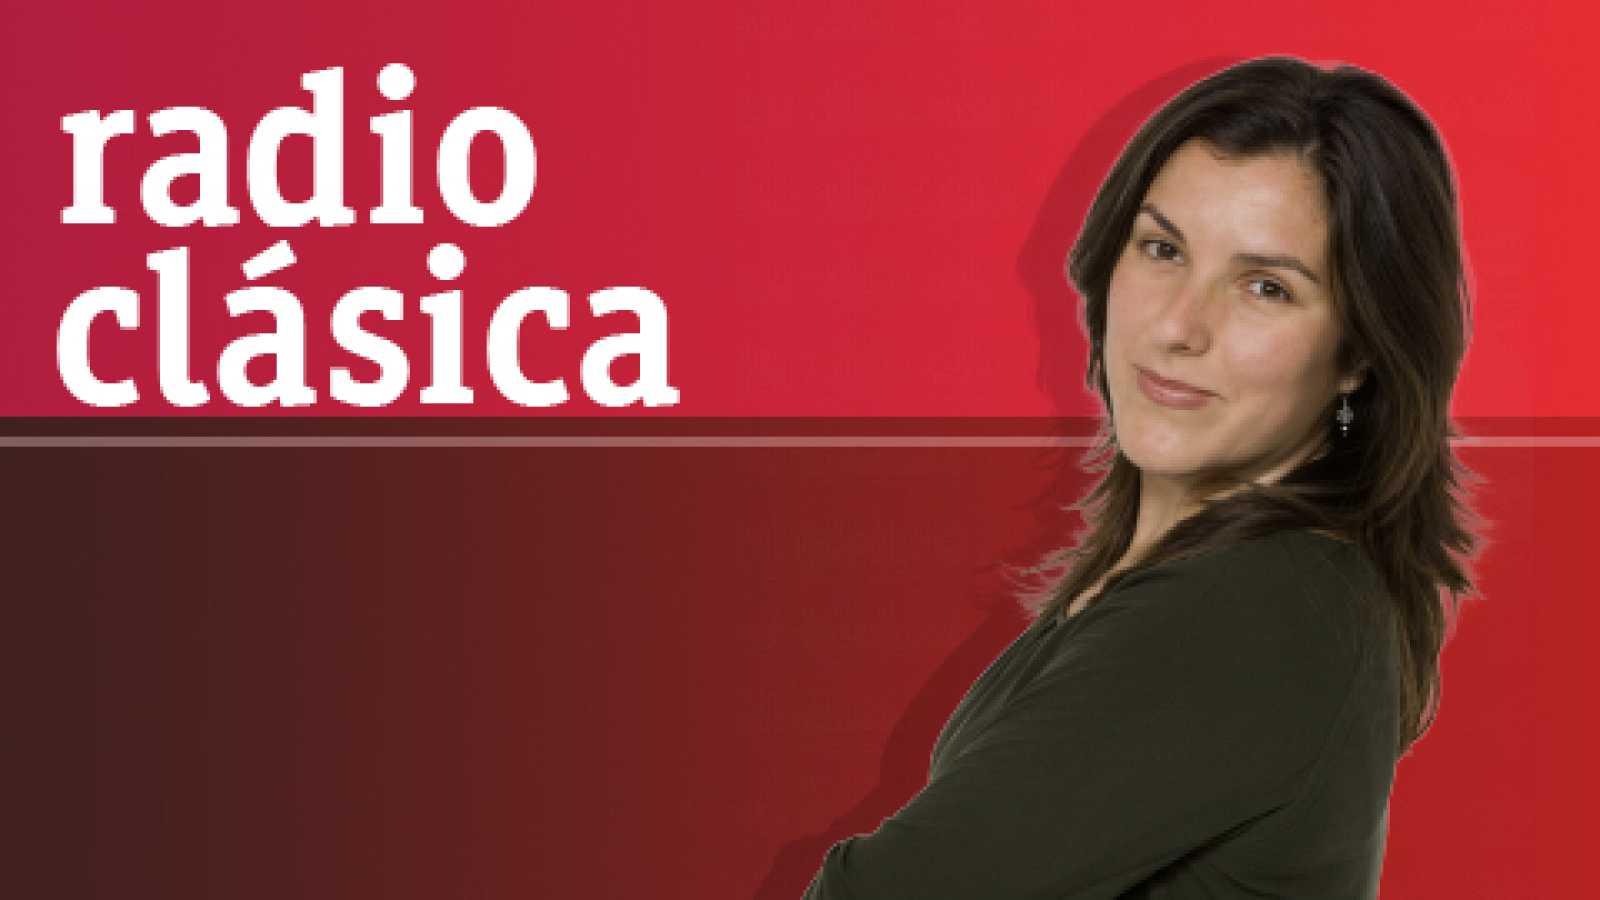 Los clásicos - Ainhoa Arteta - 01/10/12 - Escuchar ahora